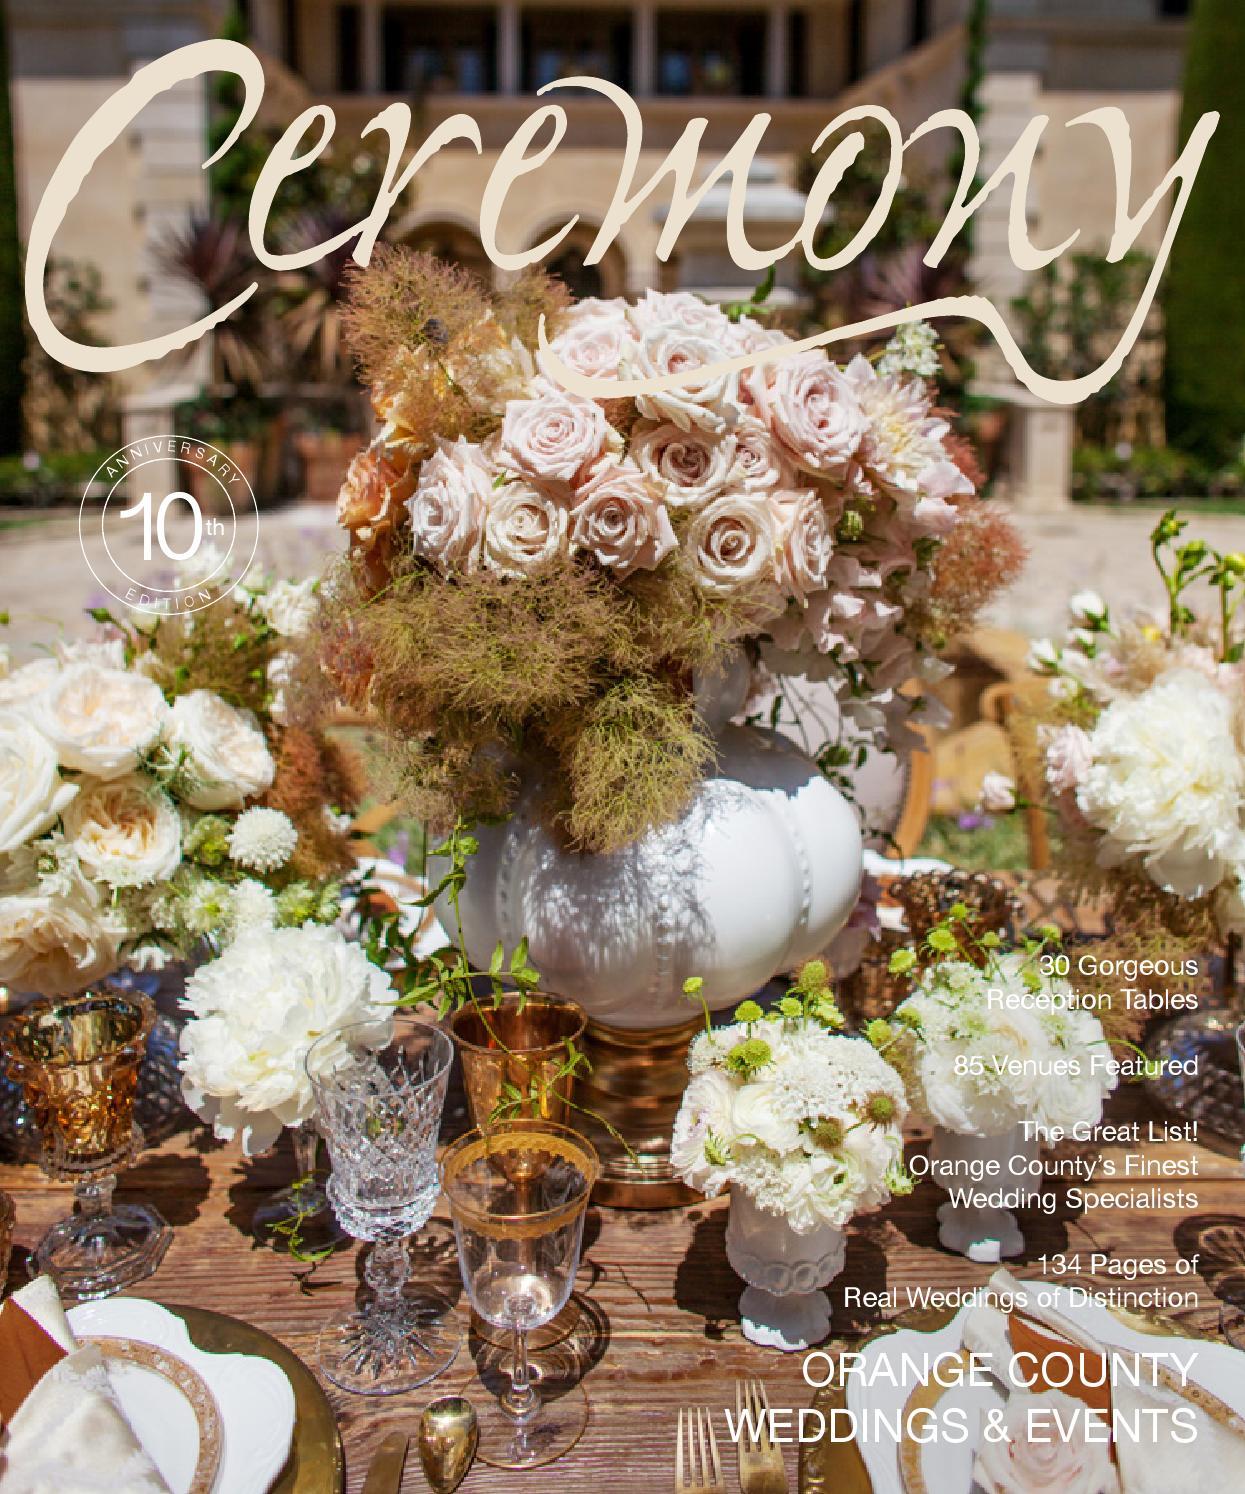 Ceremony Magazine 2014 Orange County By Ceremony Magazine